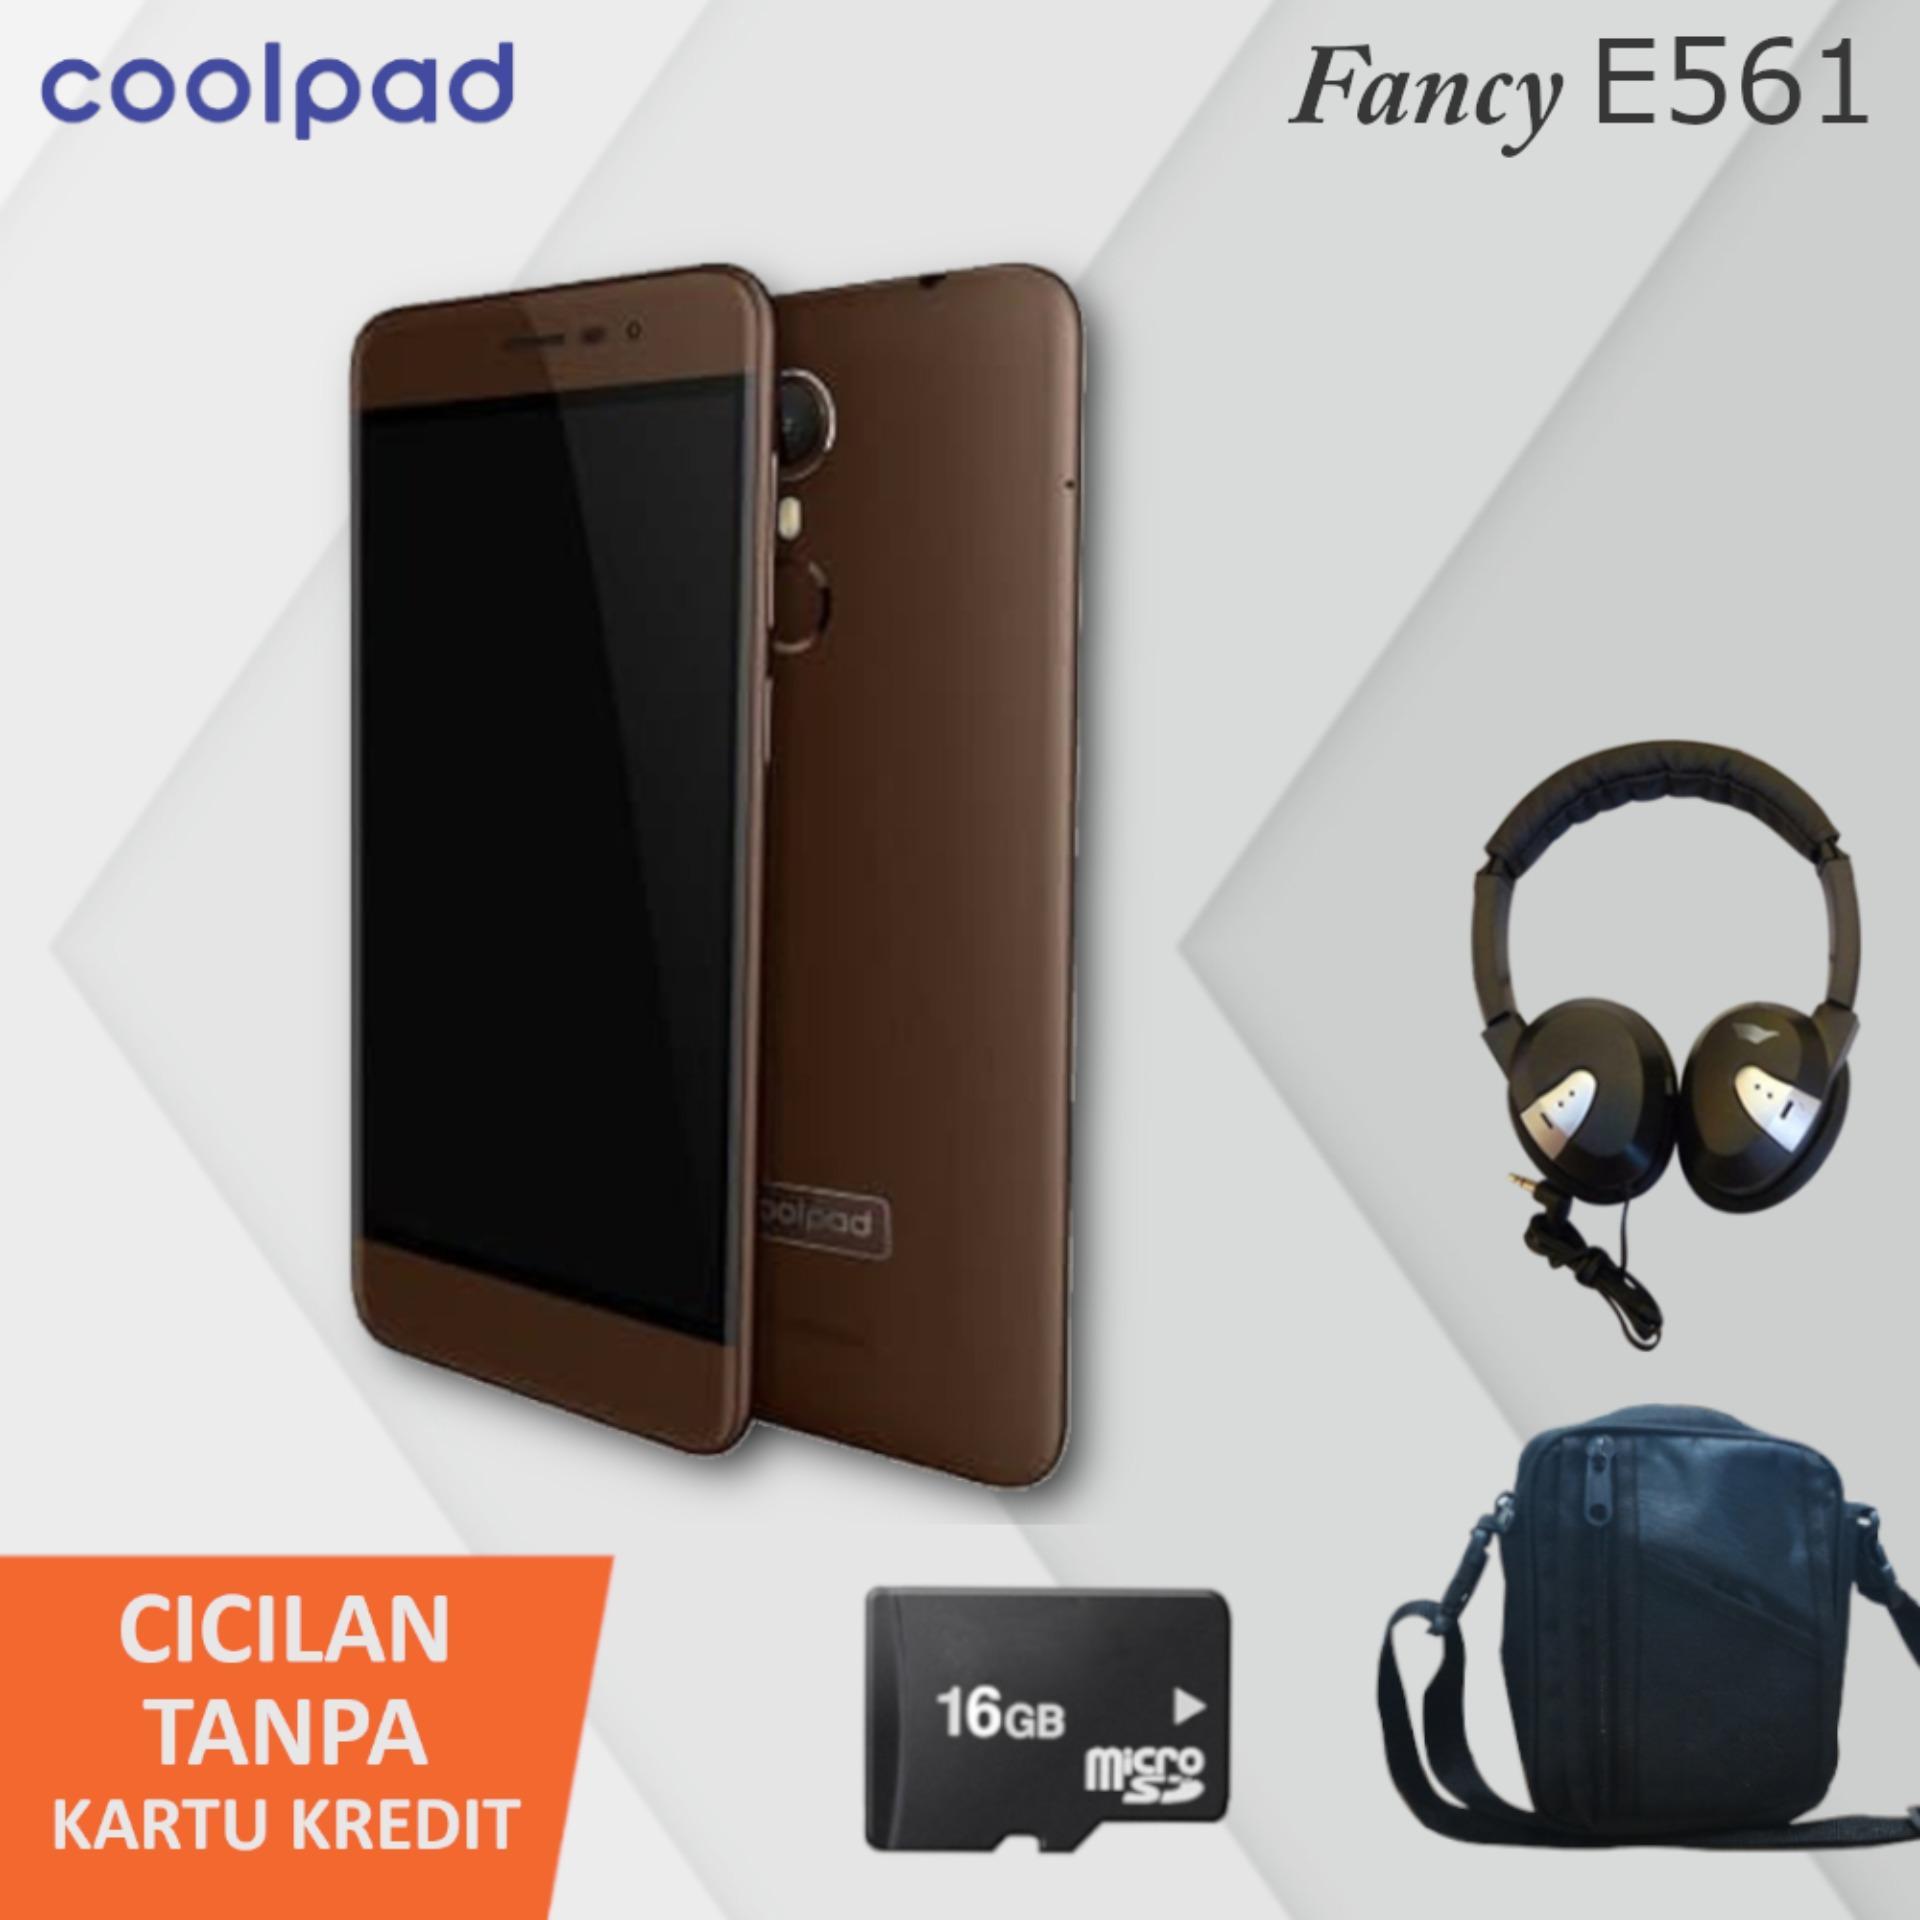 Handphone Coolpad Series Terbaru Ume Leather Case Sarung For Sky 3 E502 Flipshell Flipcover Fancy E561